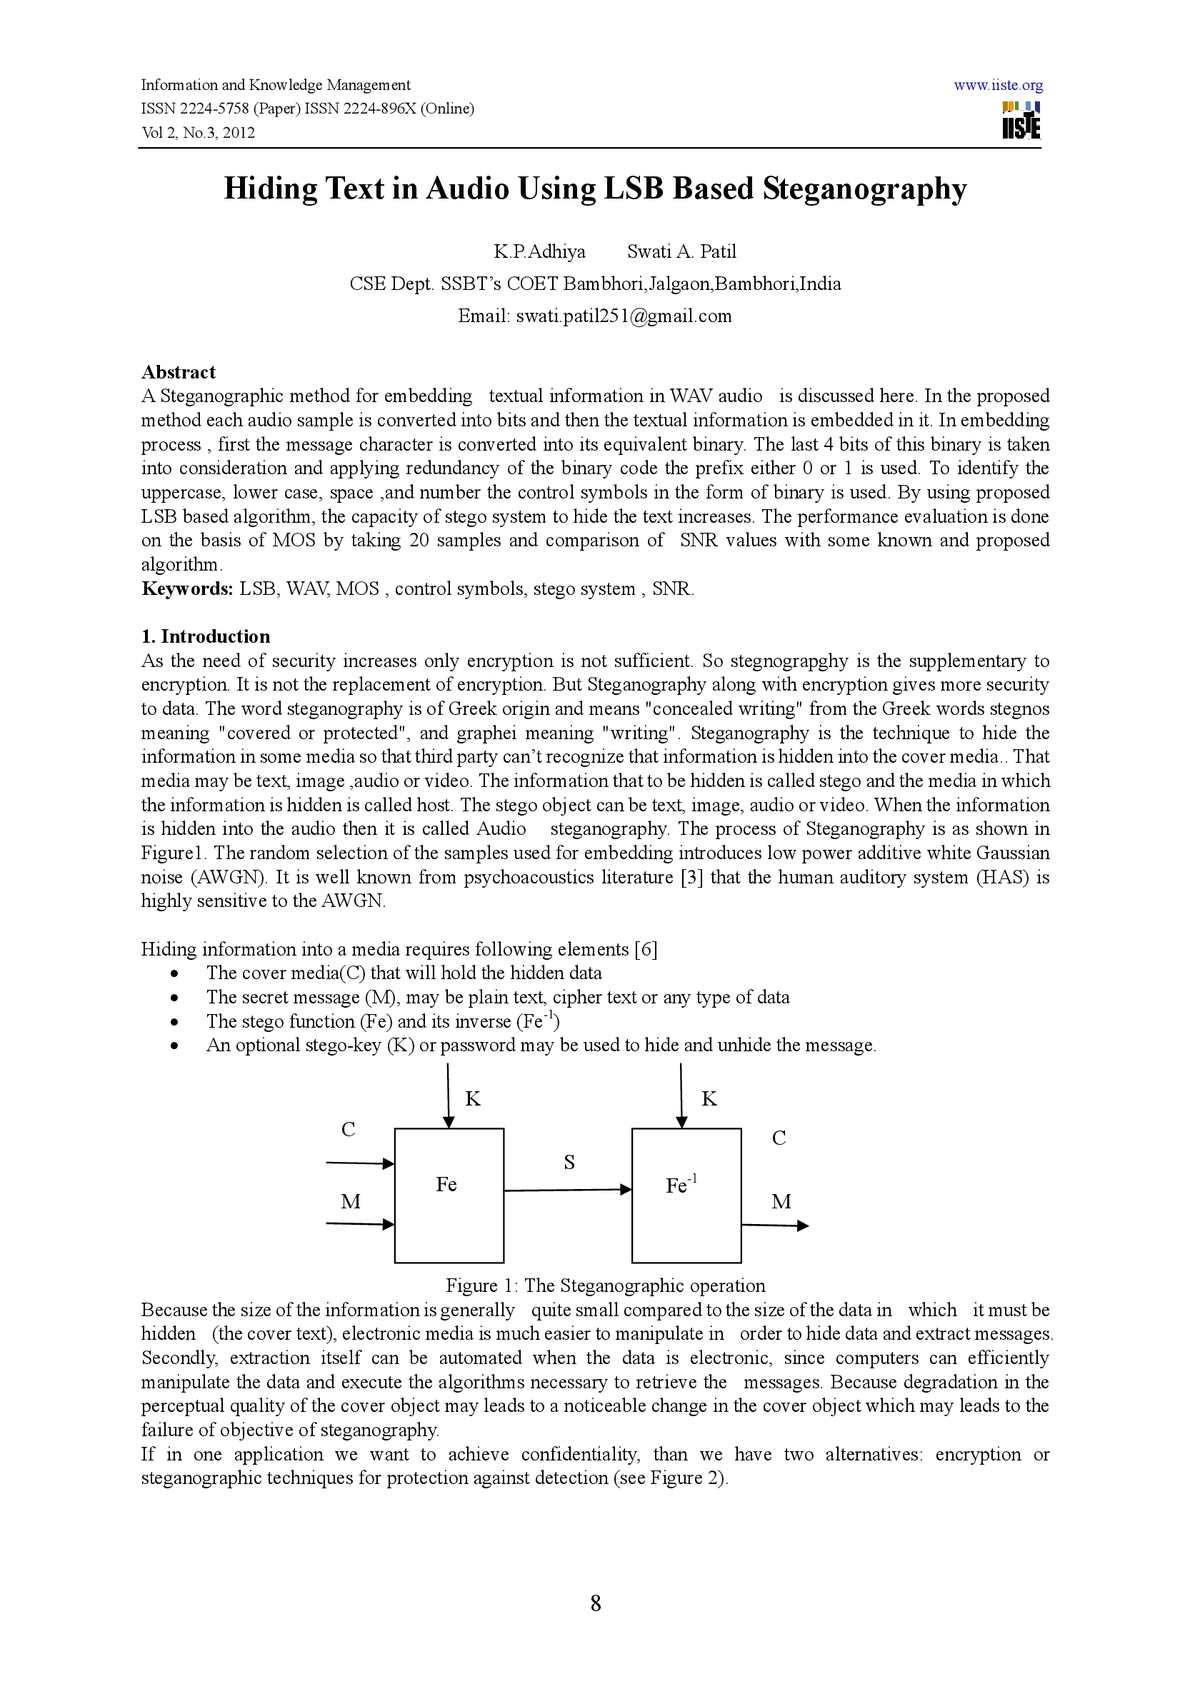 Calaméo - Hiding Text in Audio Using LSB Based Steganography